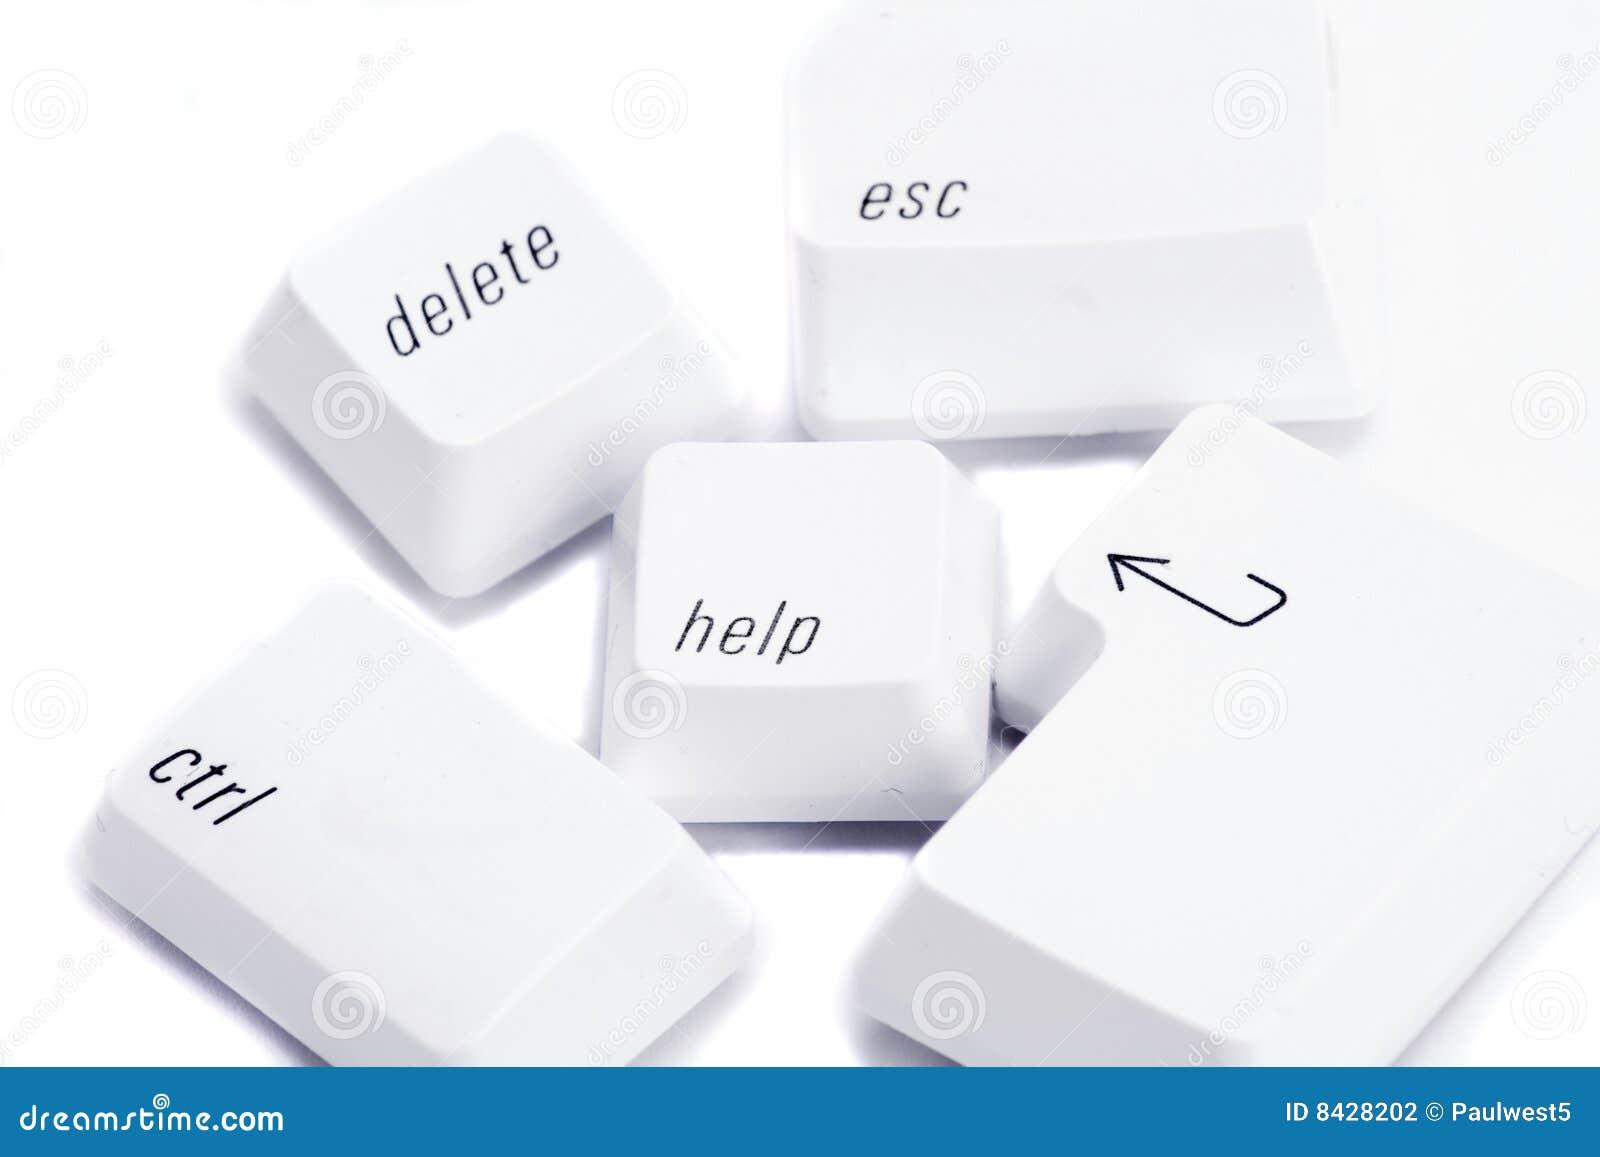 Various computer keys